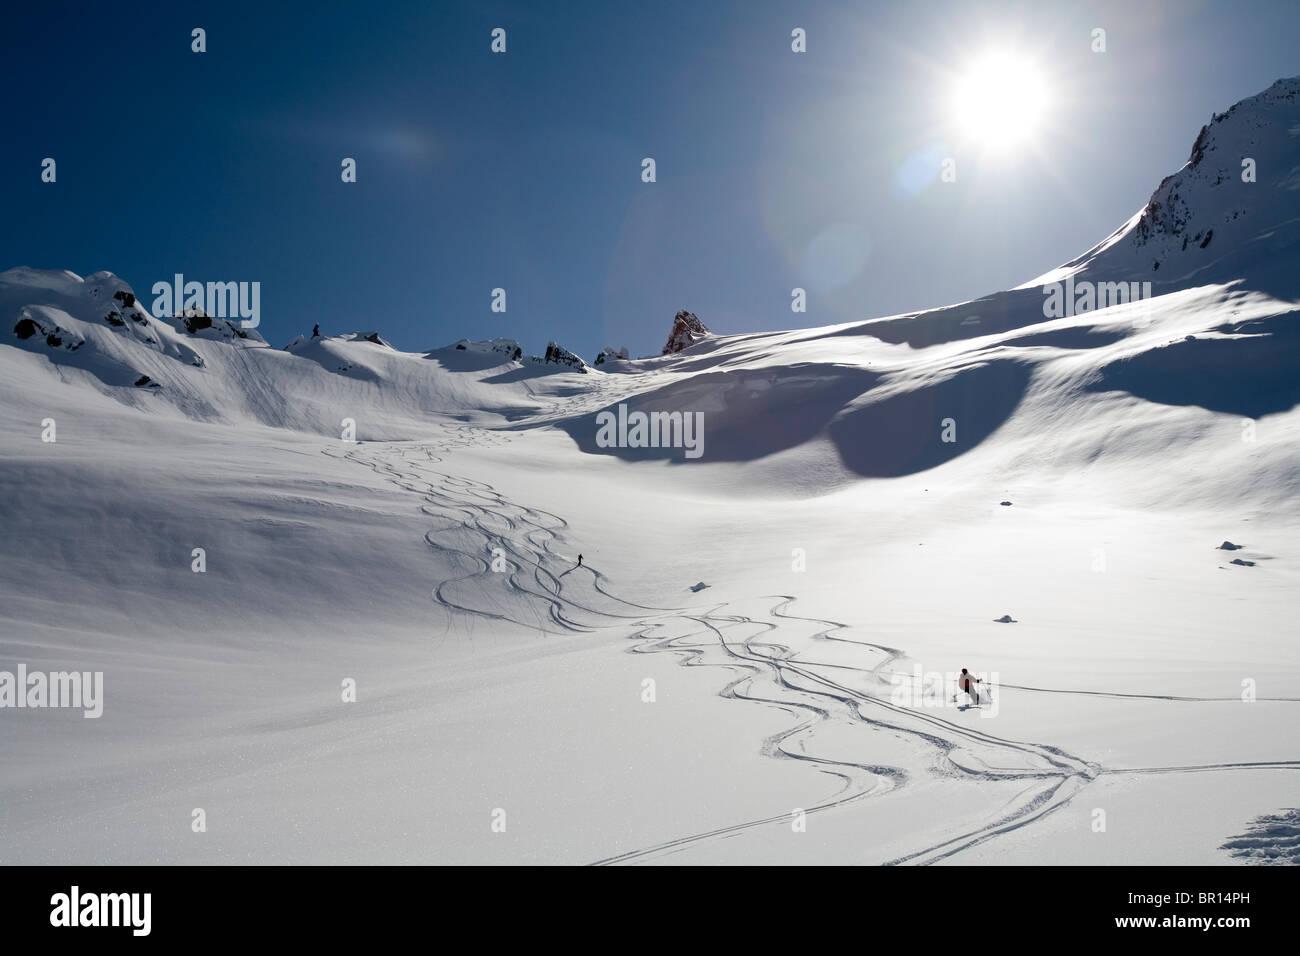 Man skis down hill in Alaska backcountry near Alaska Canada border Stock Photo